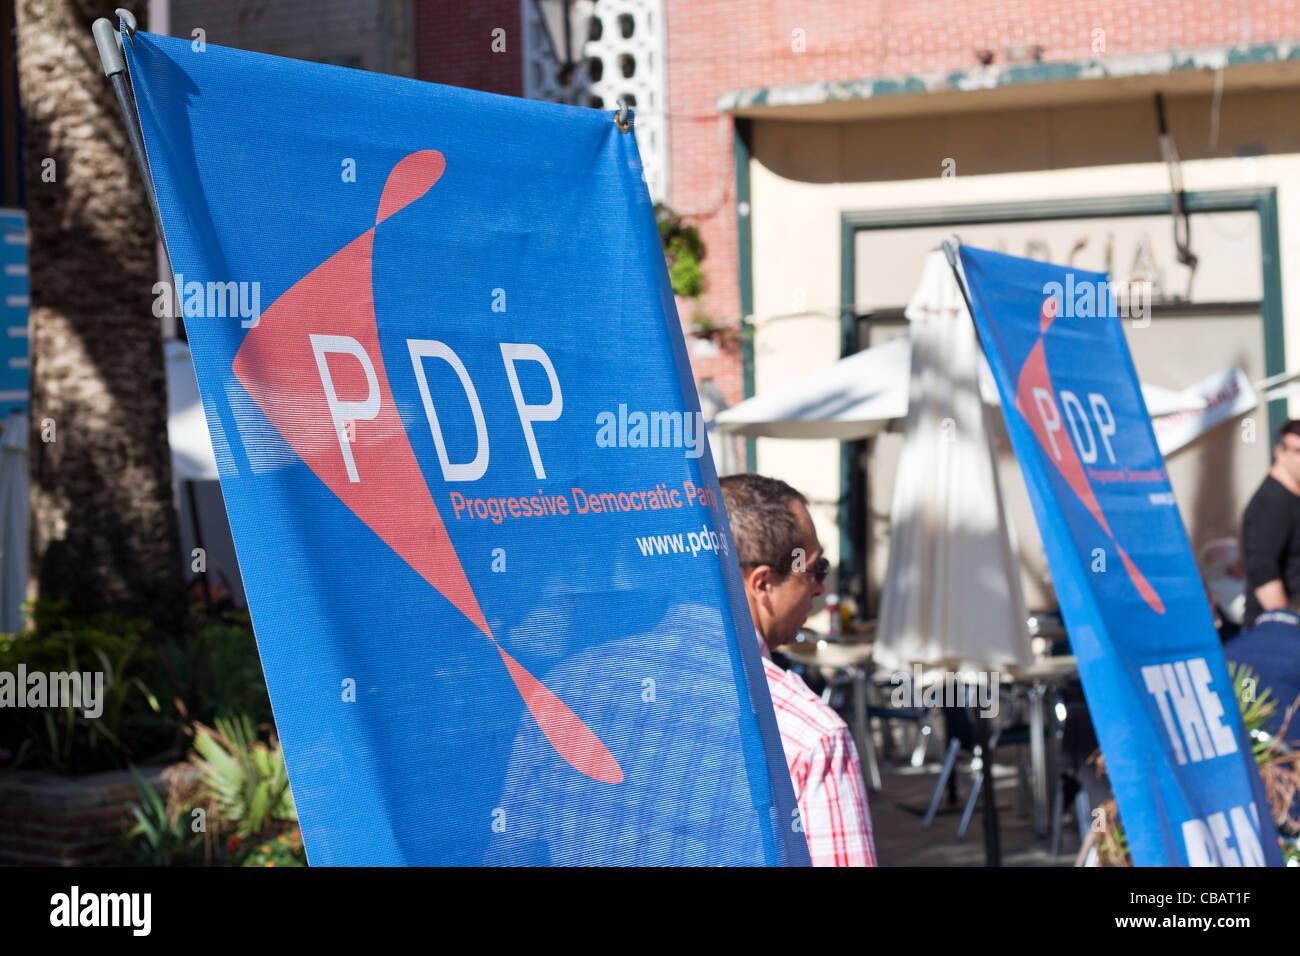 Progressive Democratic Party banner in Gibraltar. - Stock Image